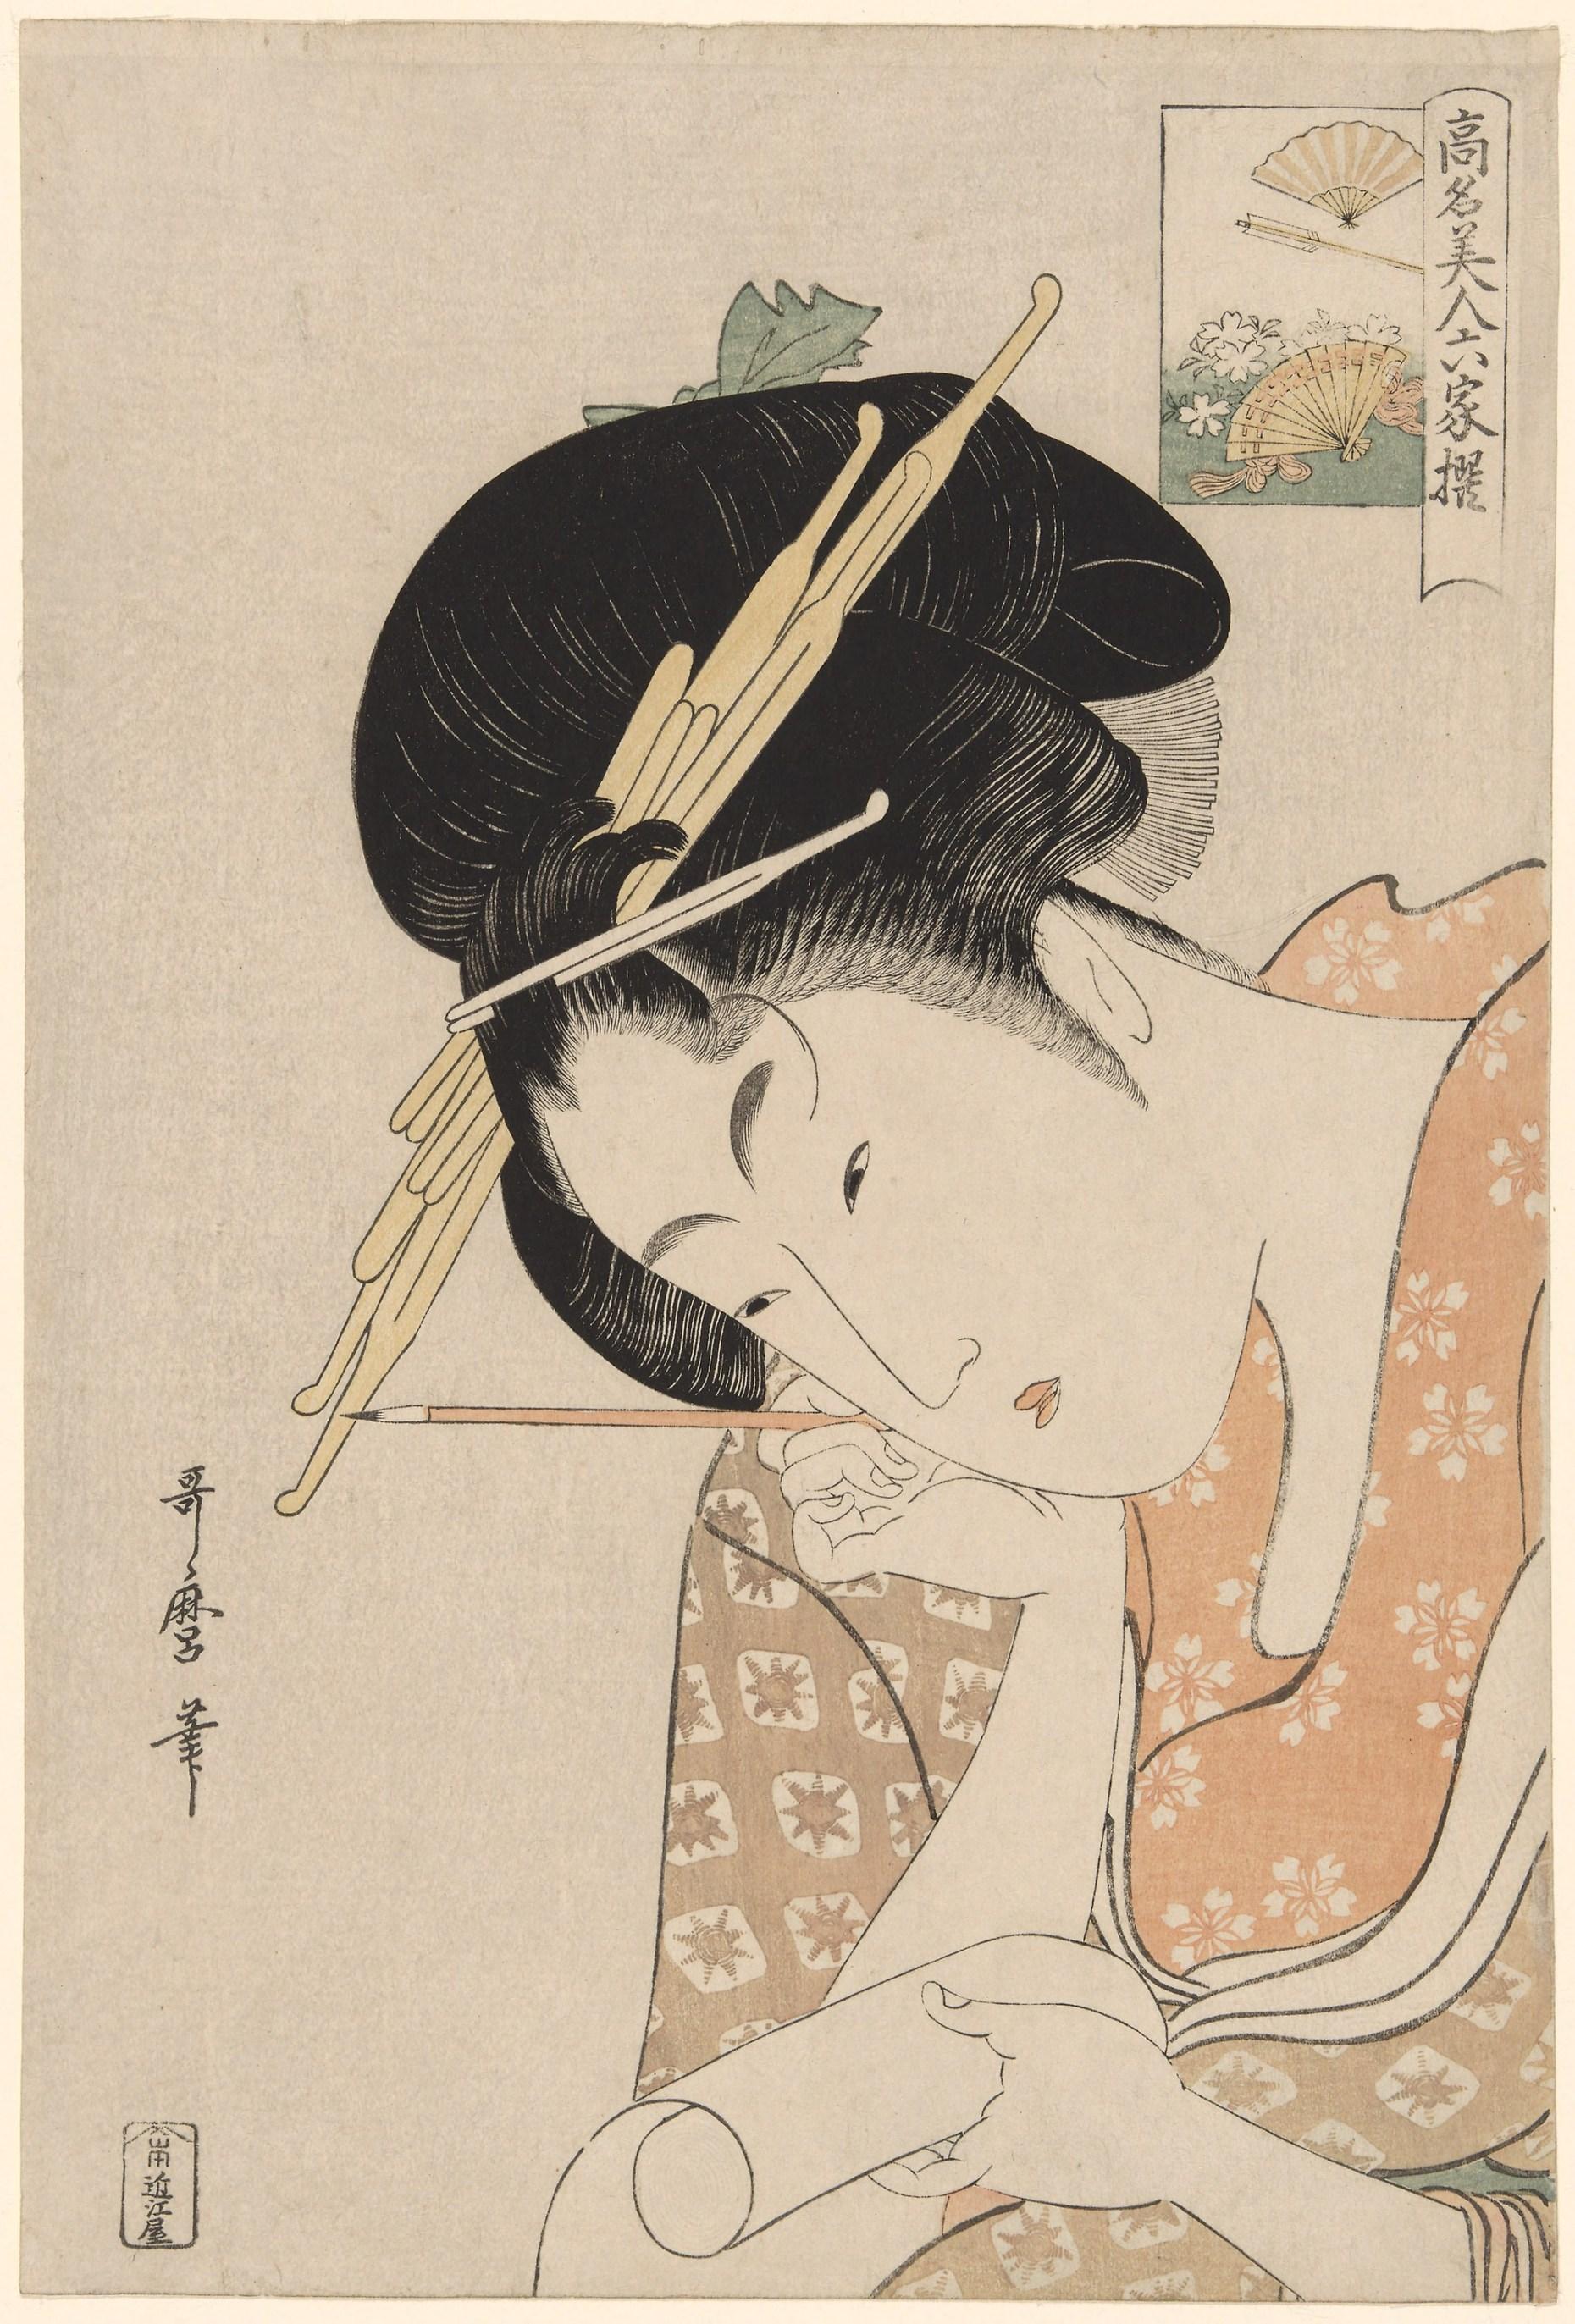 Kitagawa Utamaro, Hanaogi of the Ogiya, Renowned Beauties